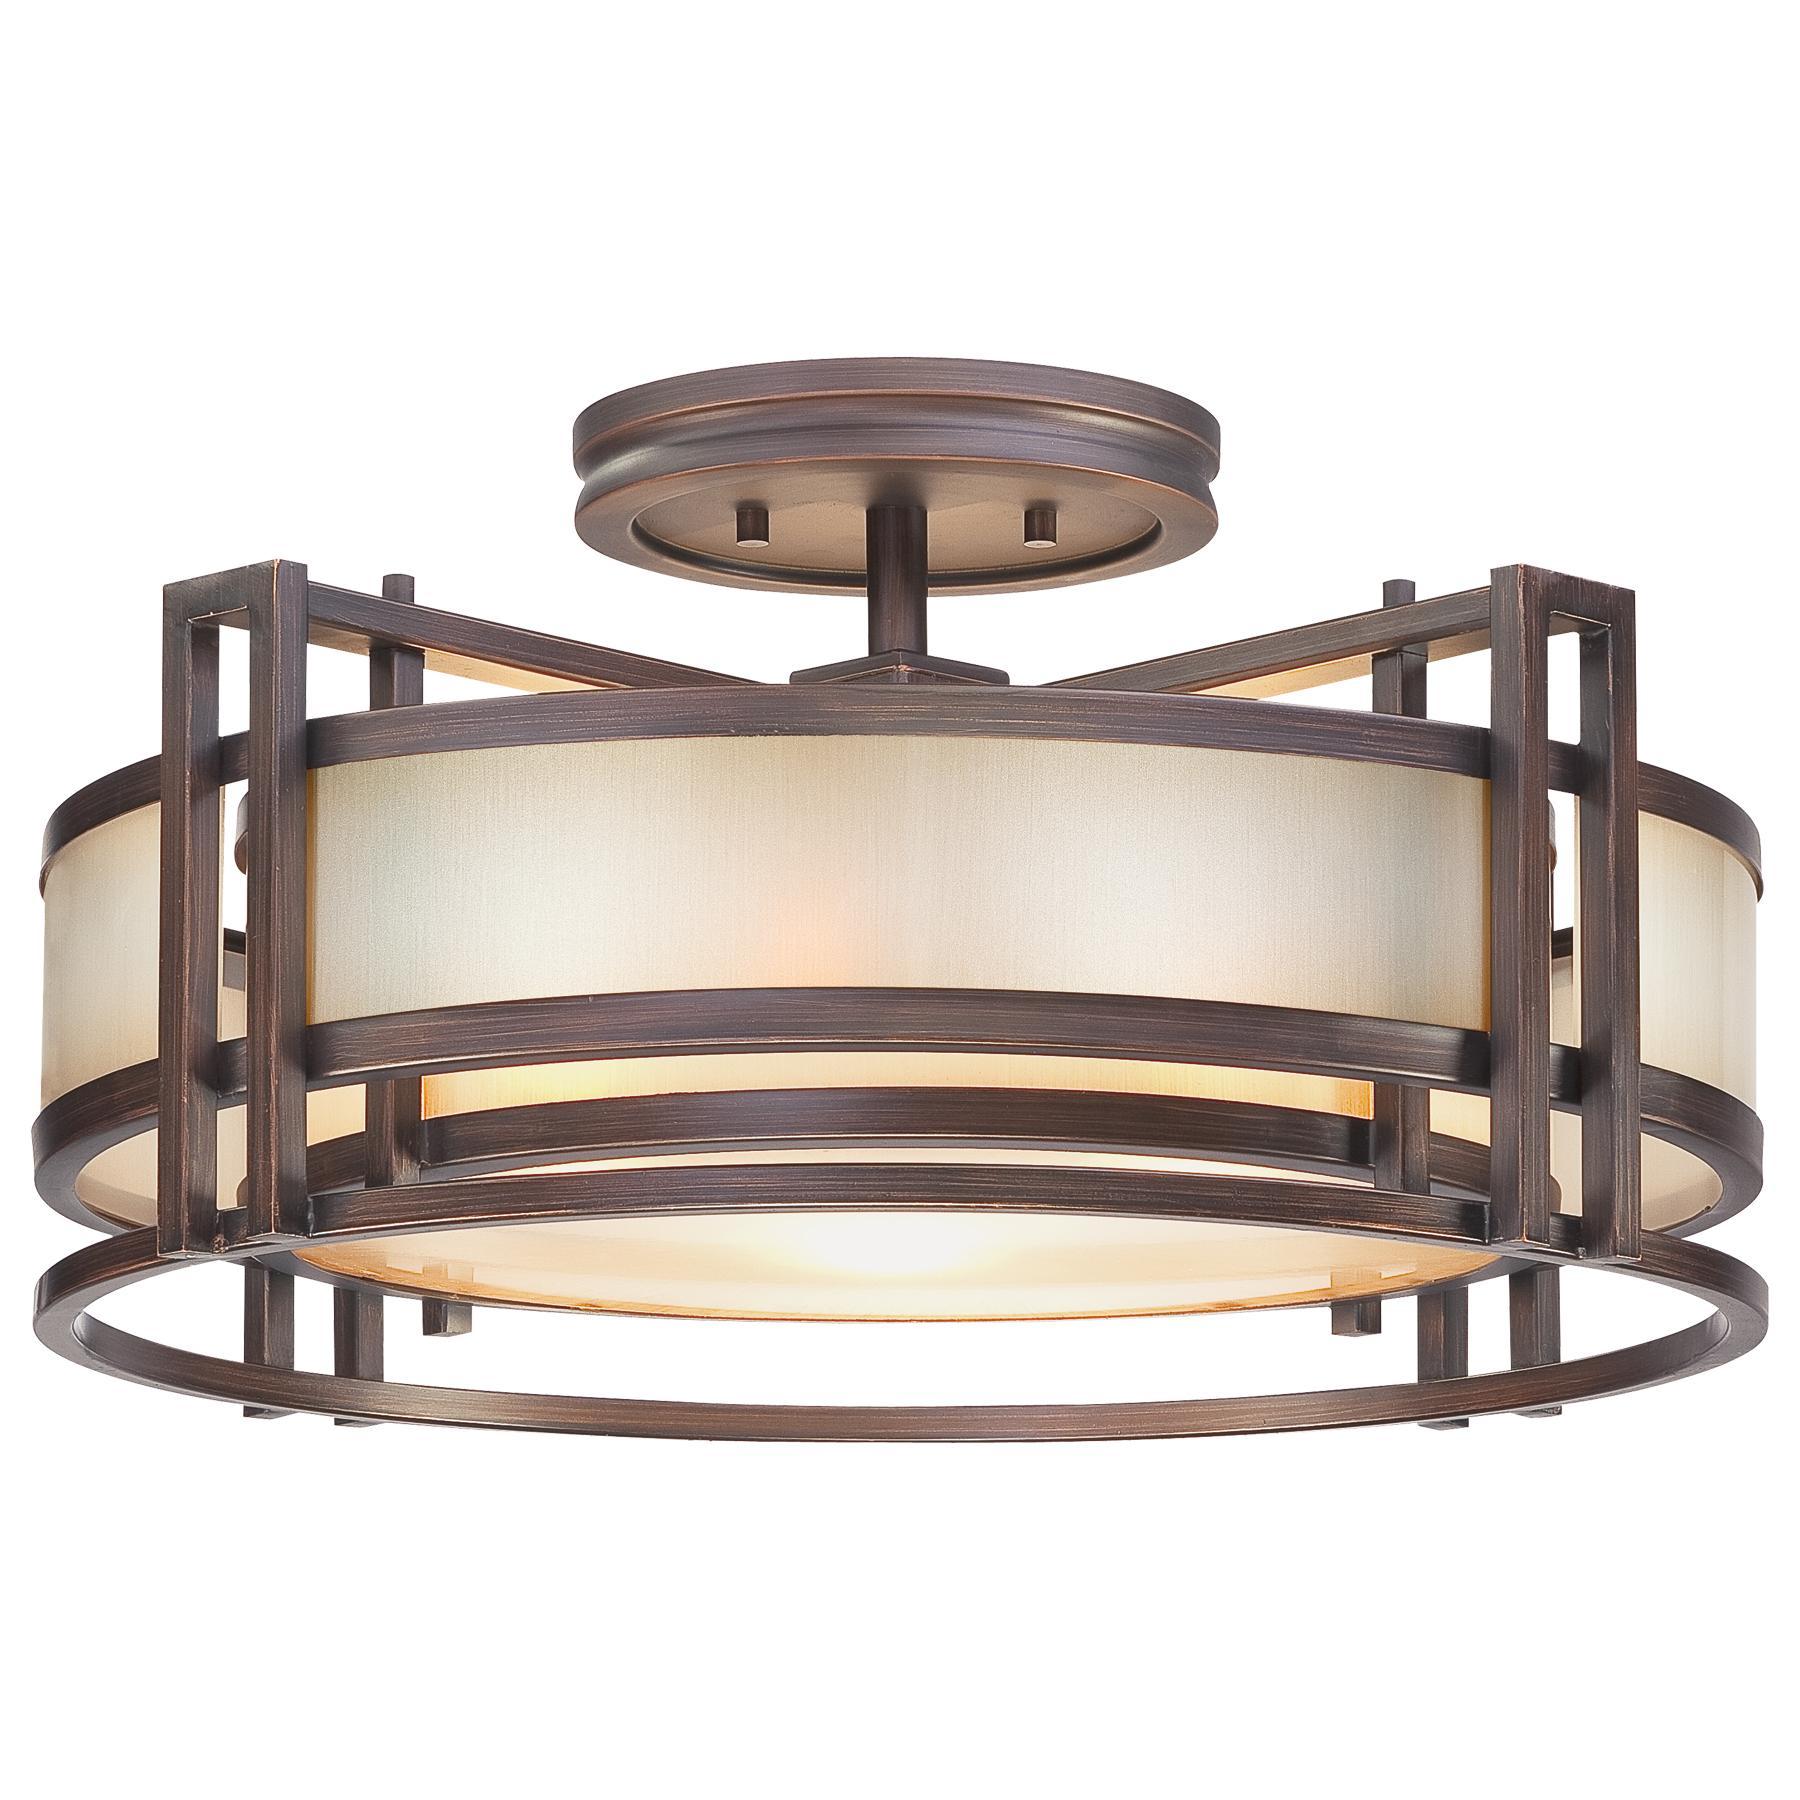 Underscore Ceiling Semi Flush Light By Metropolitan Lighting N6964 1 267b